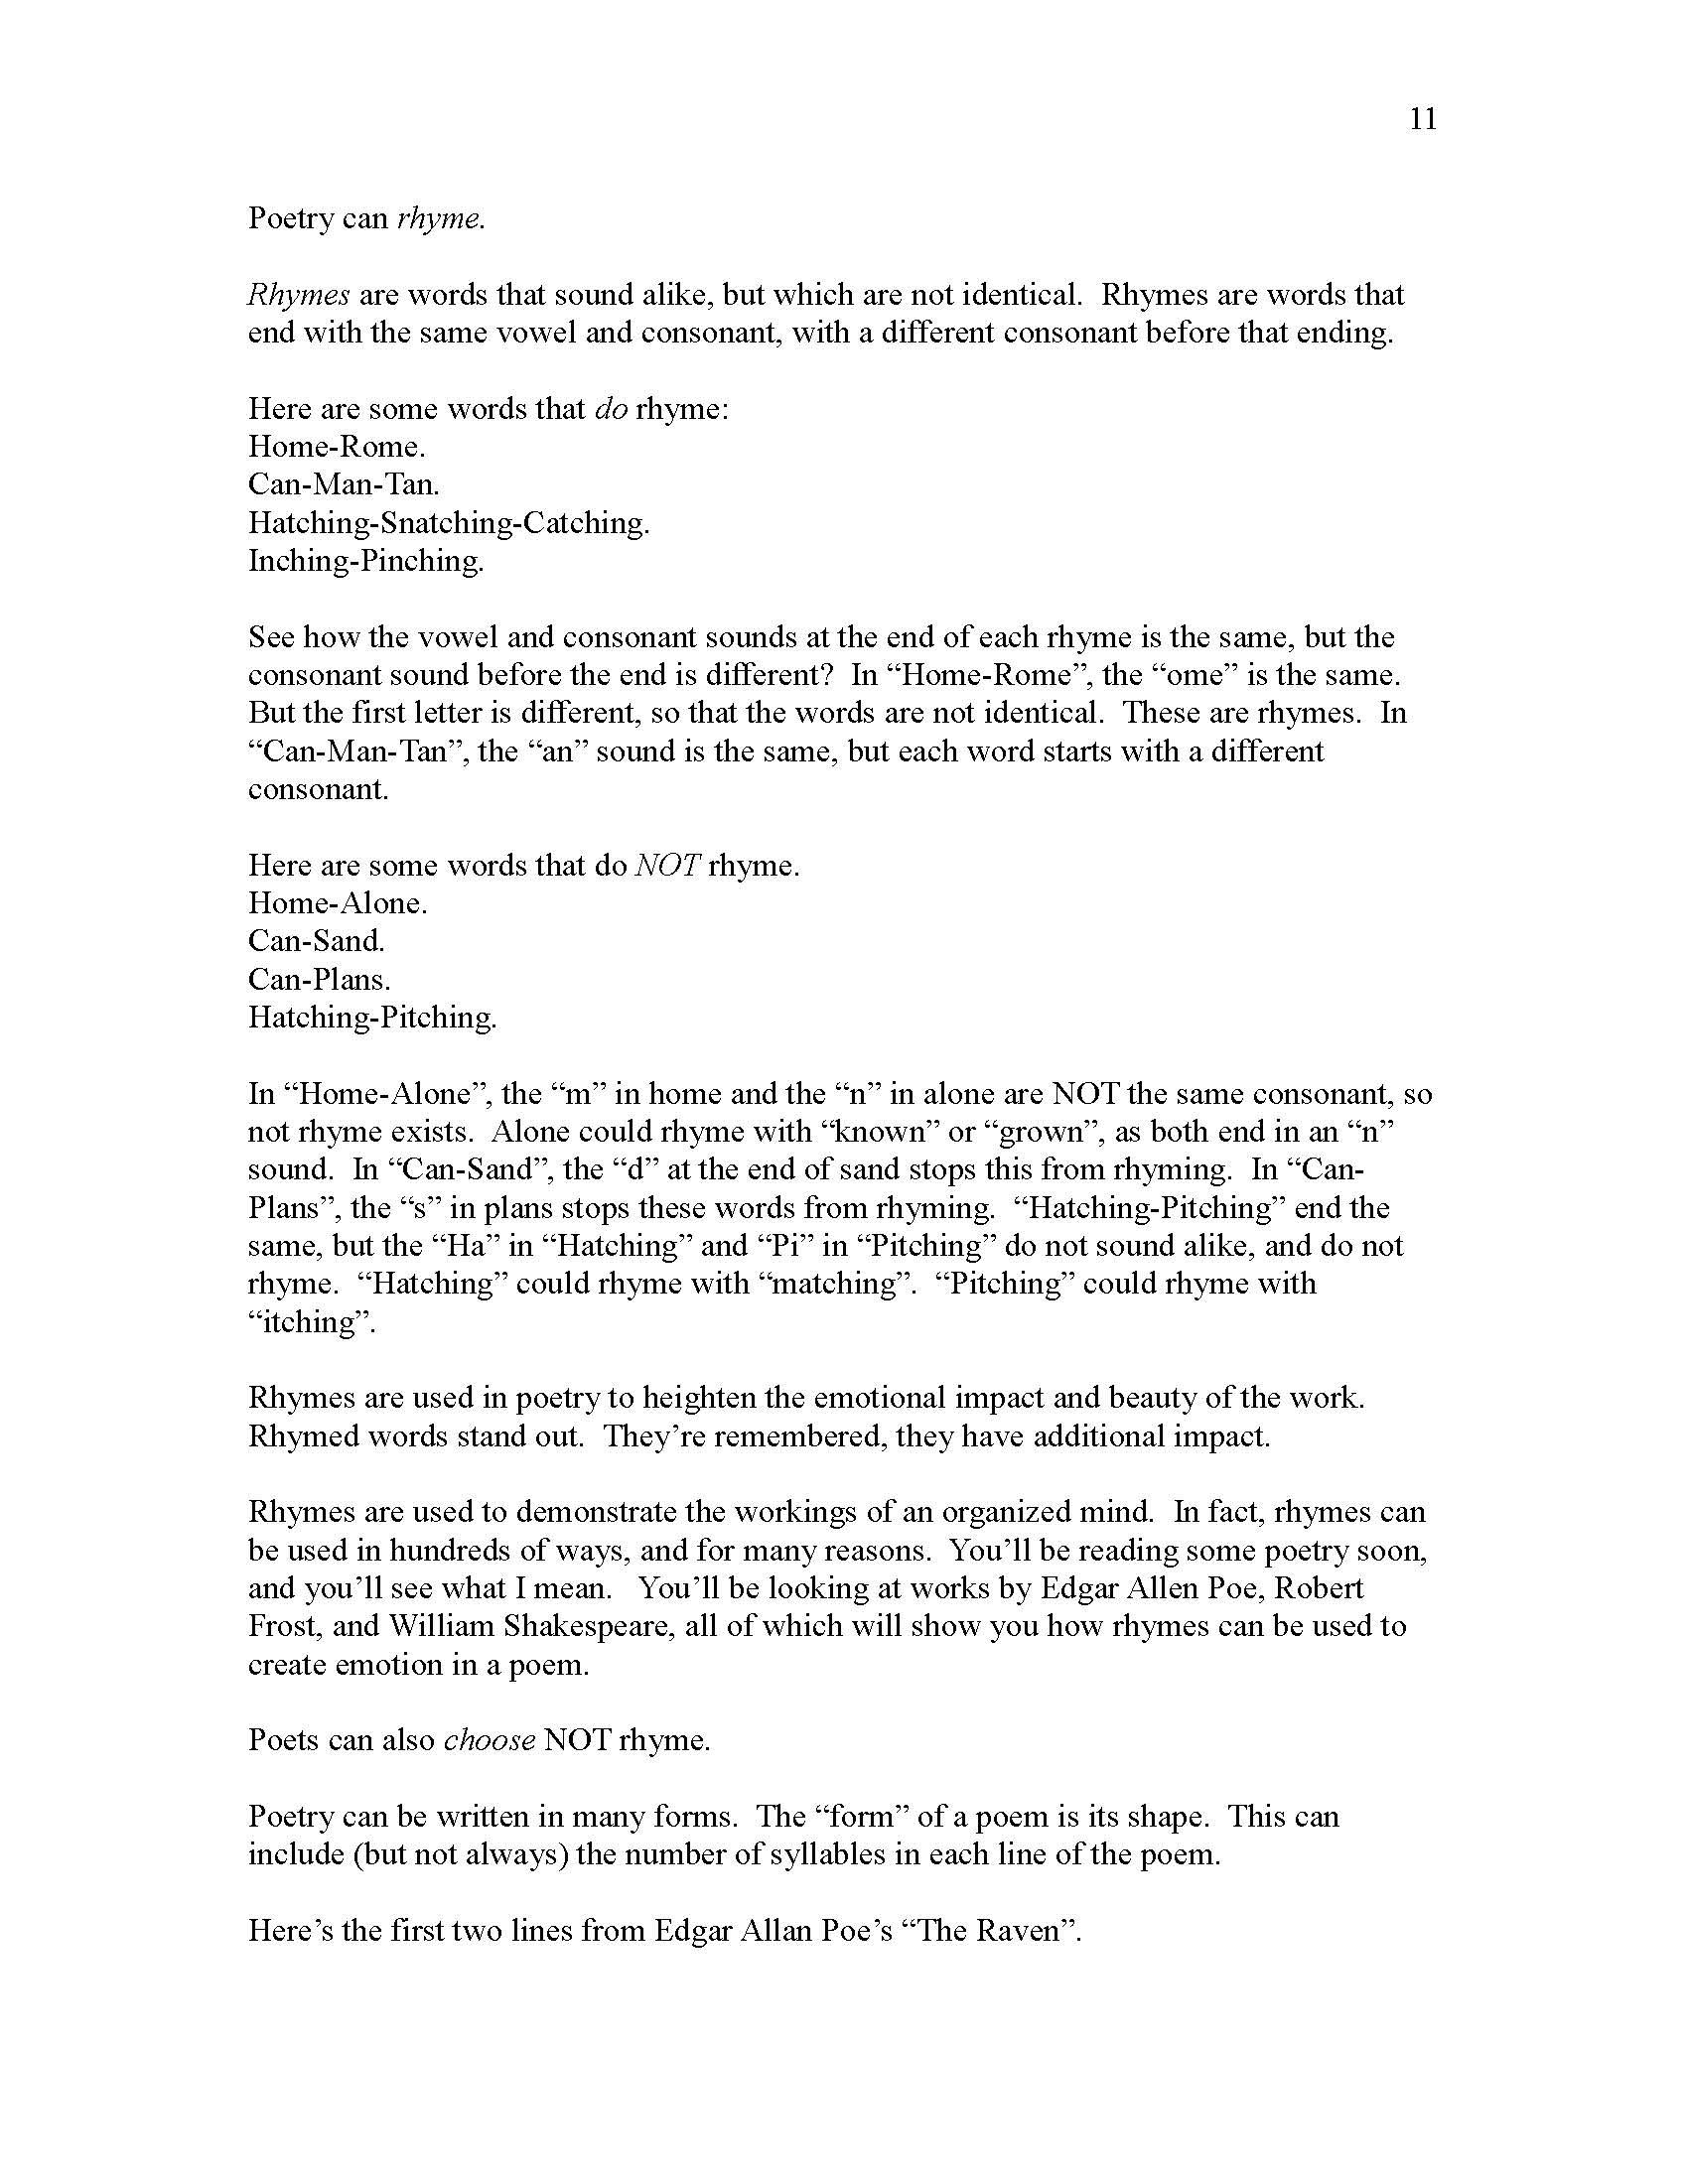 Step 4 Creative Writing 5 - The Field_Page_012.jpg